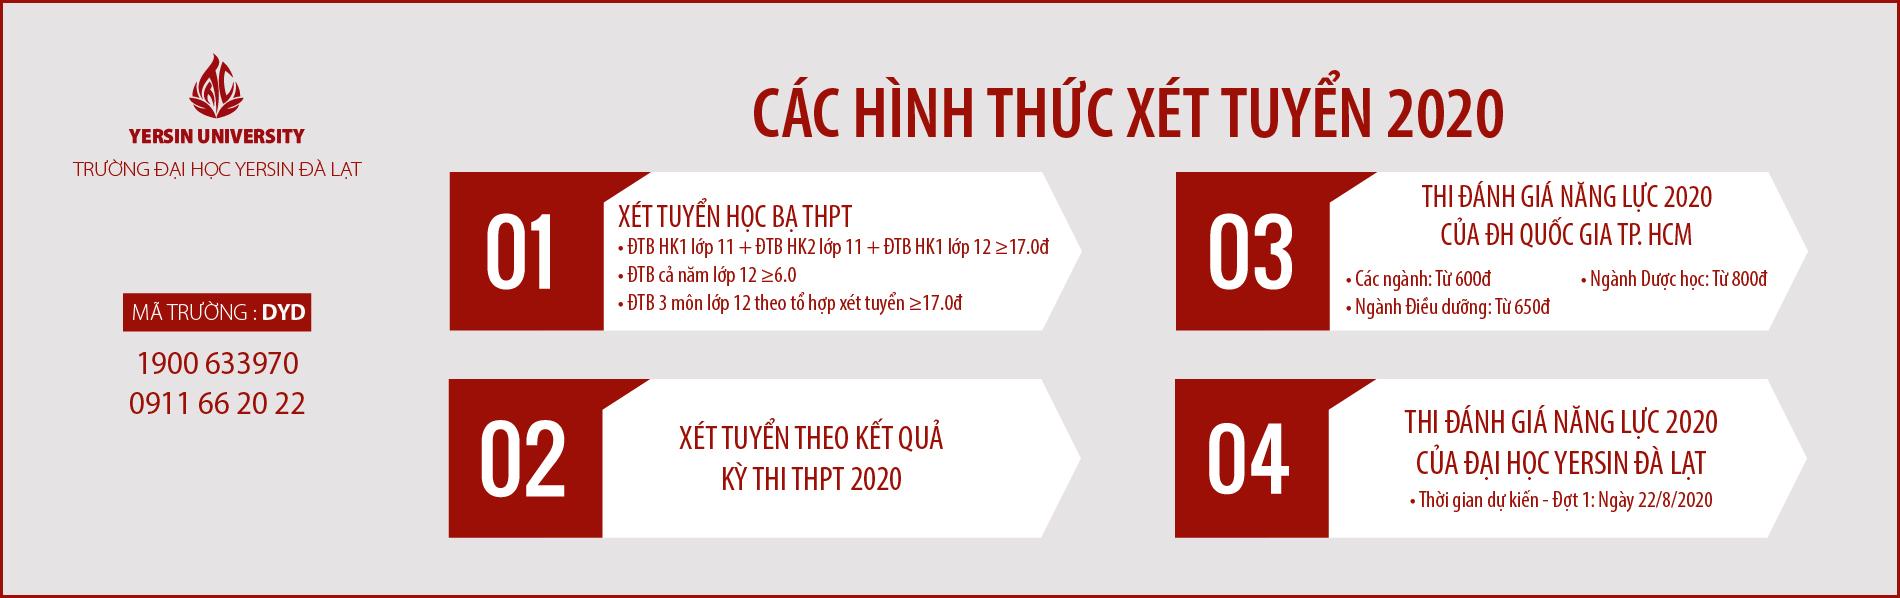 https://admin.yersin.edu.vn//Uploads/files/2020-06/03---HINH-THUC-XET-TUYEN-02-(1).jpg